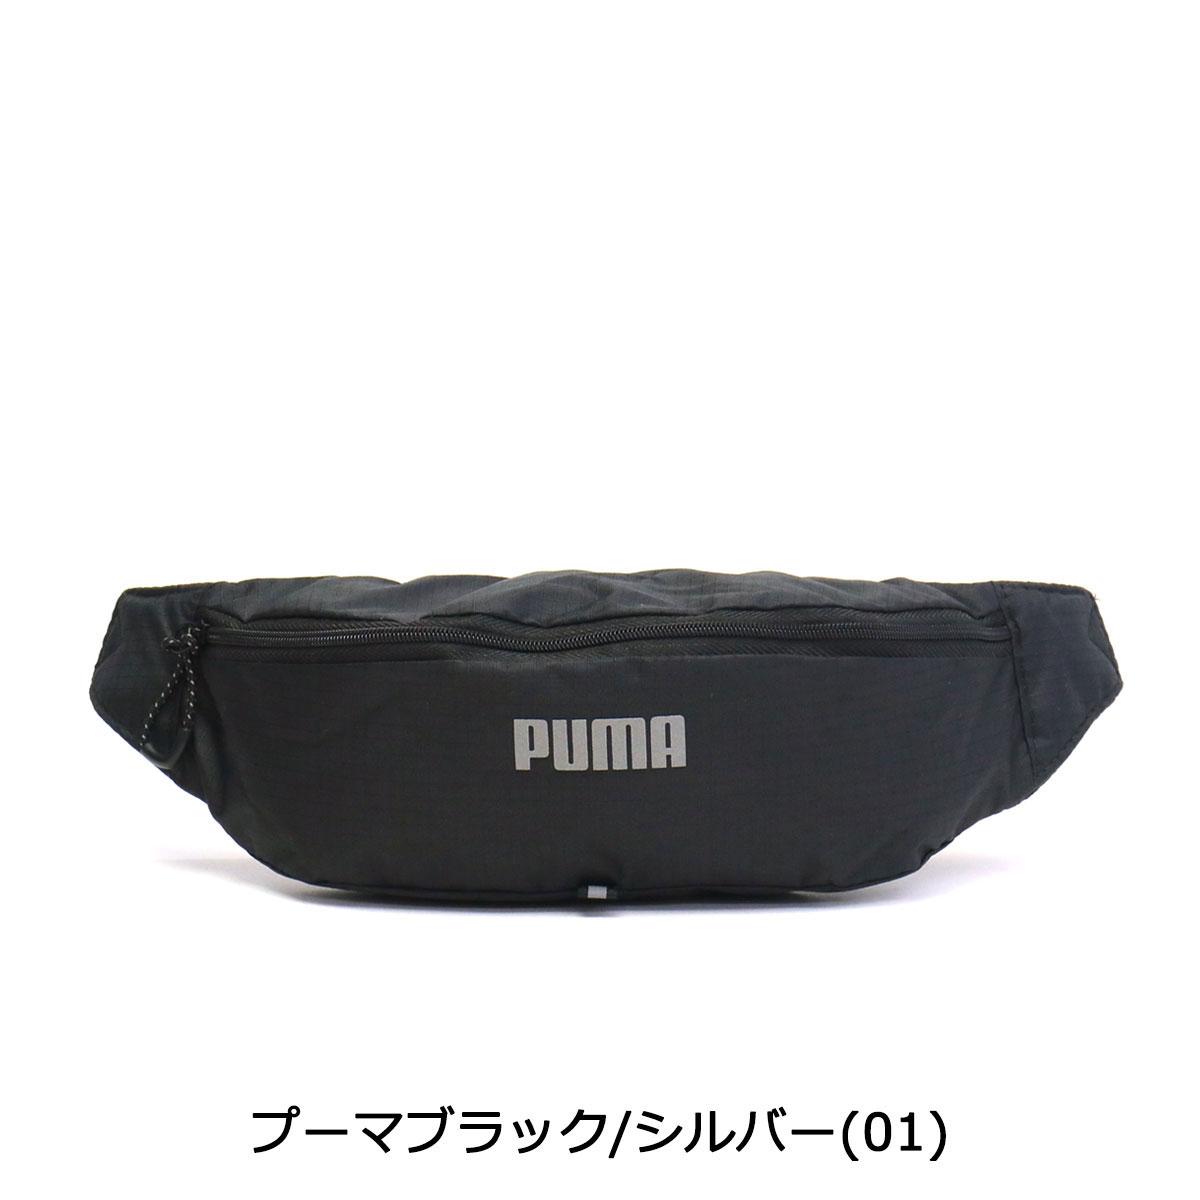 1baed7619d9  SALE 30% OFF  PUMA Waist bag womens mens hipbag PR clasical lightweight  Run training sport festival 075471